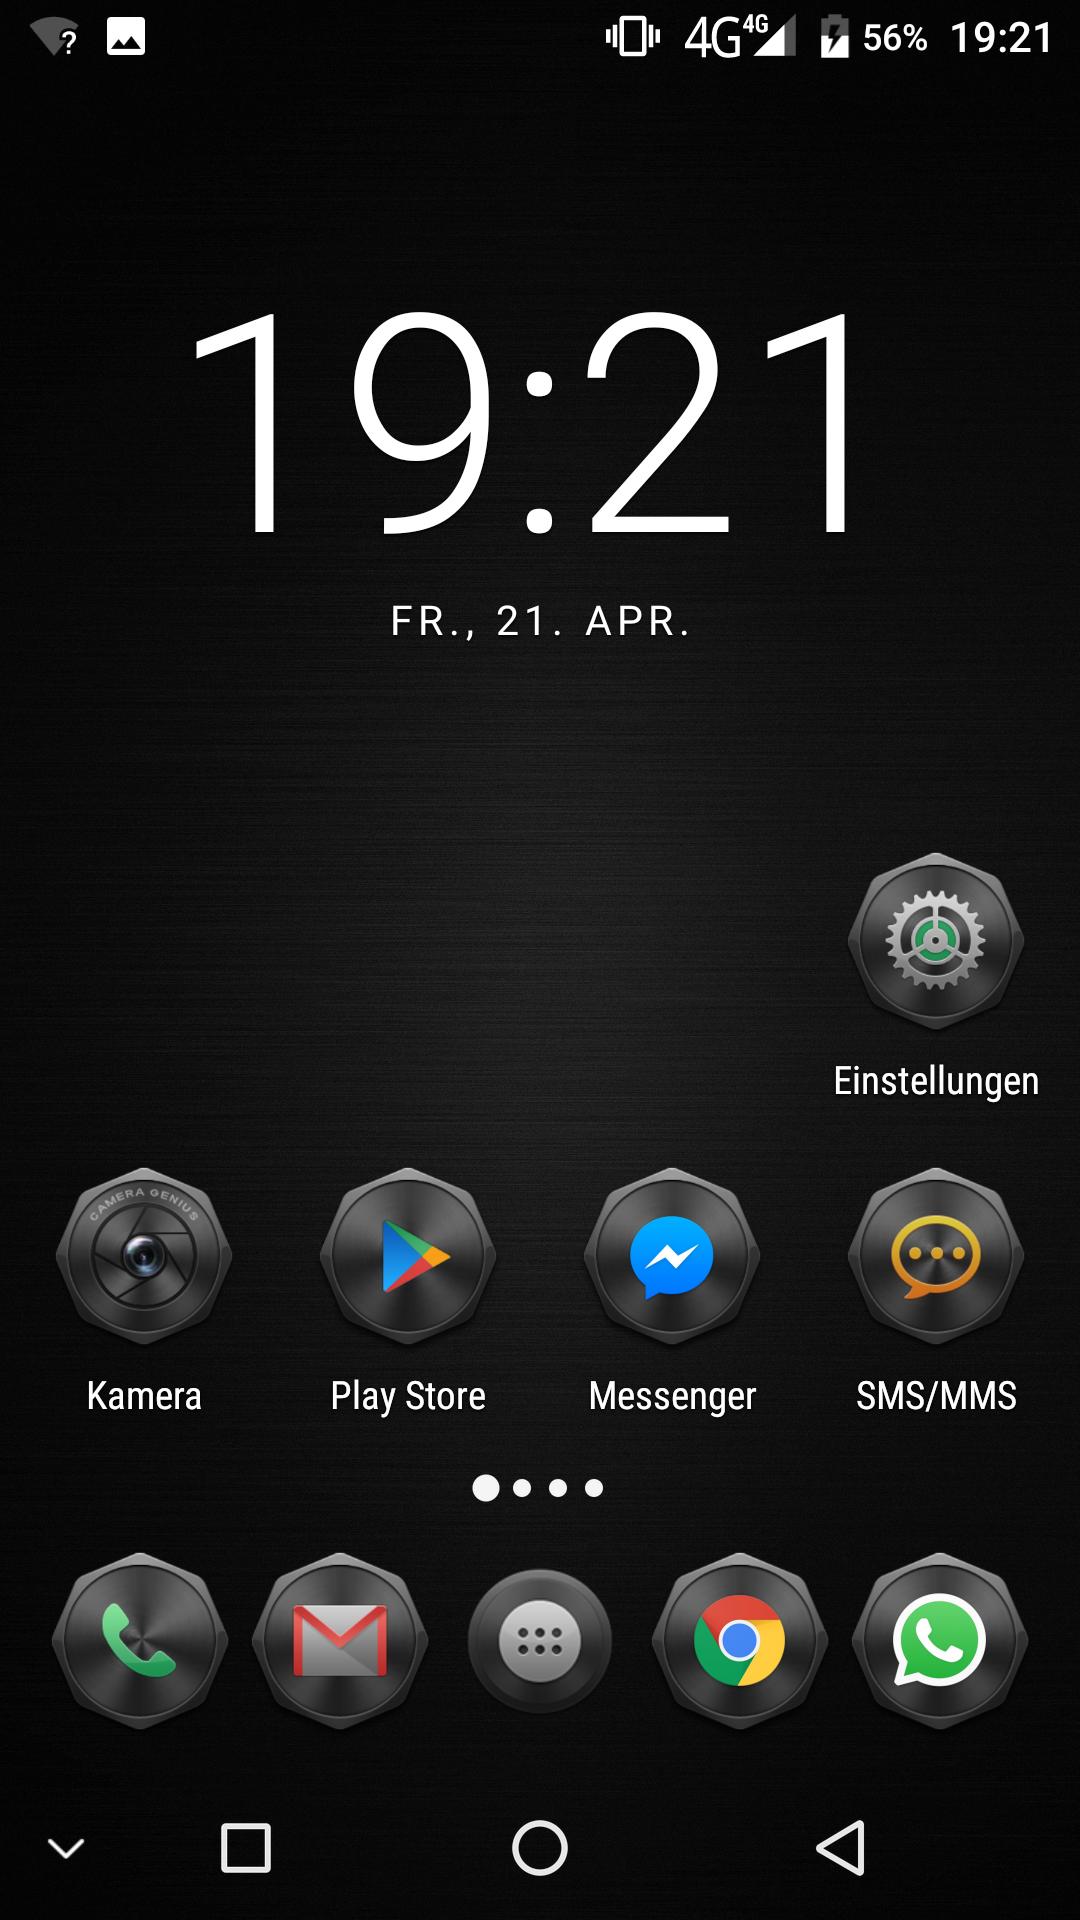 UlefonePowerII android1